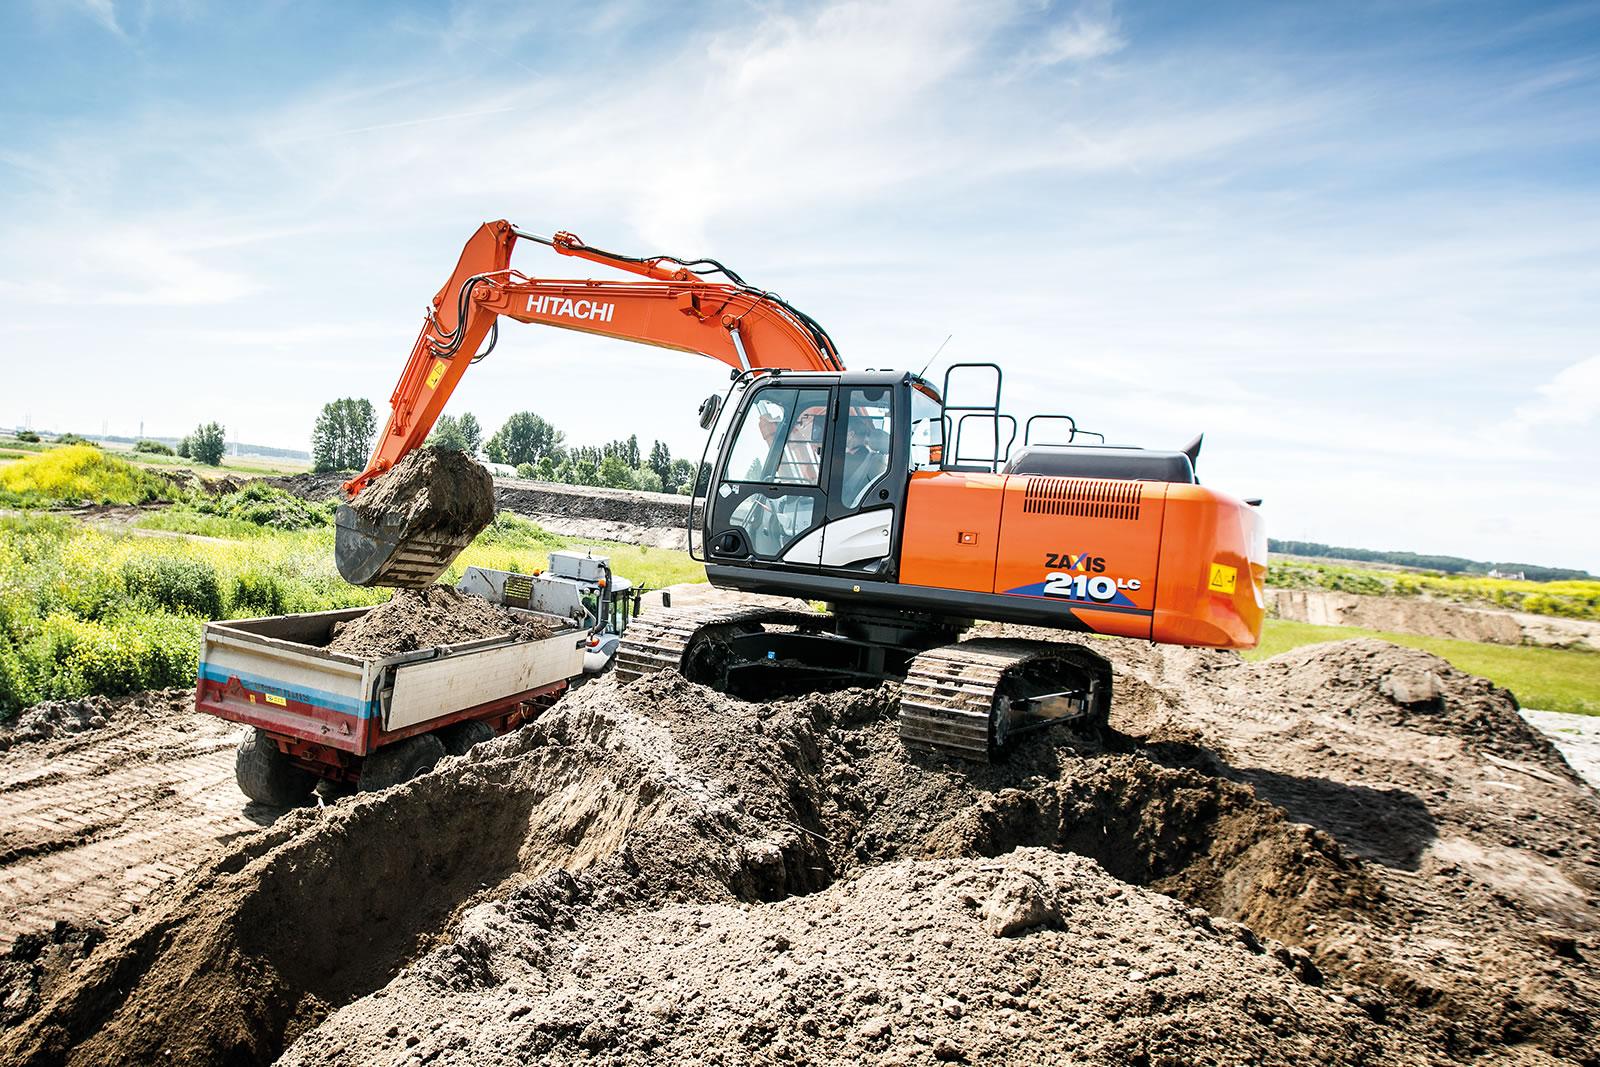 Zaxis-6 excavators are built to last